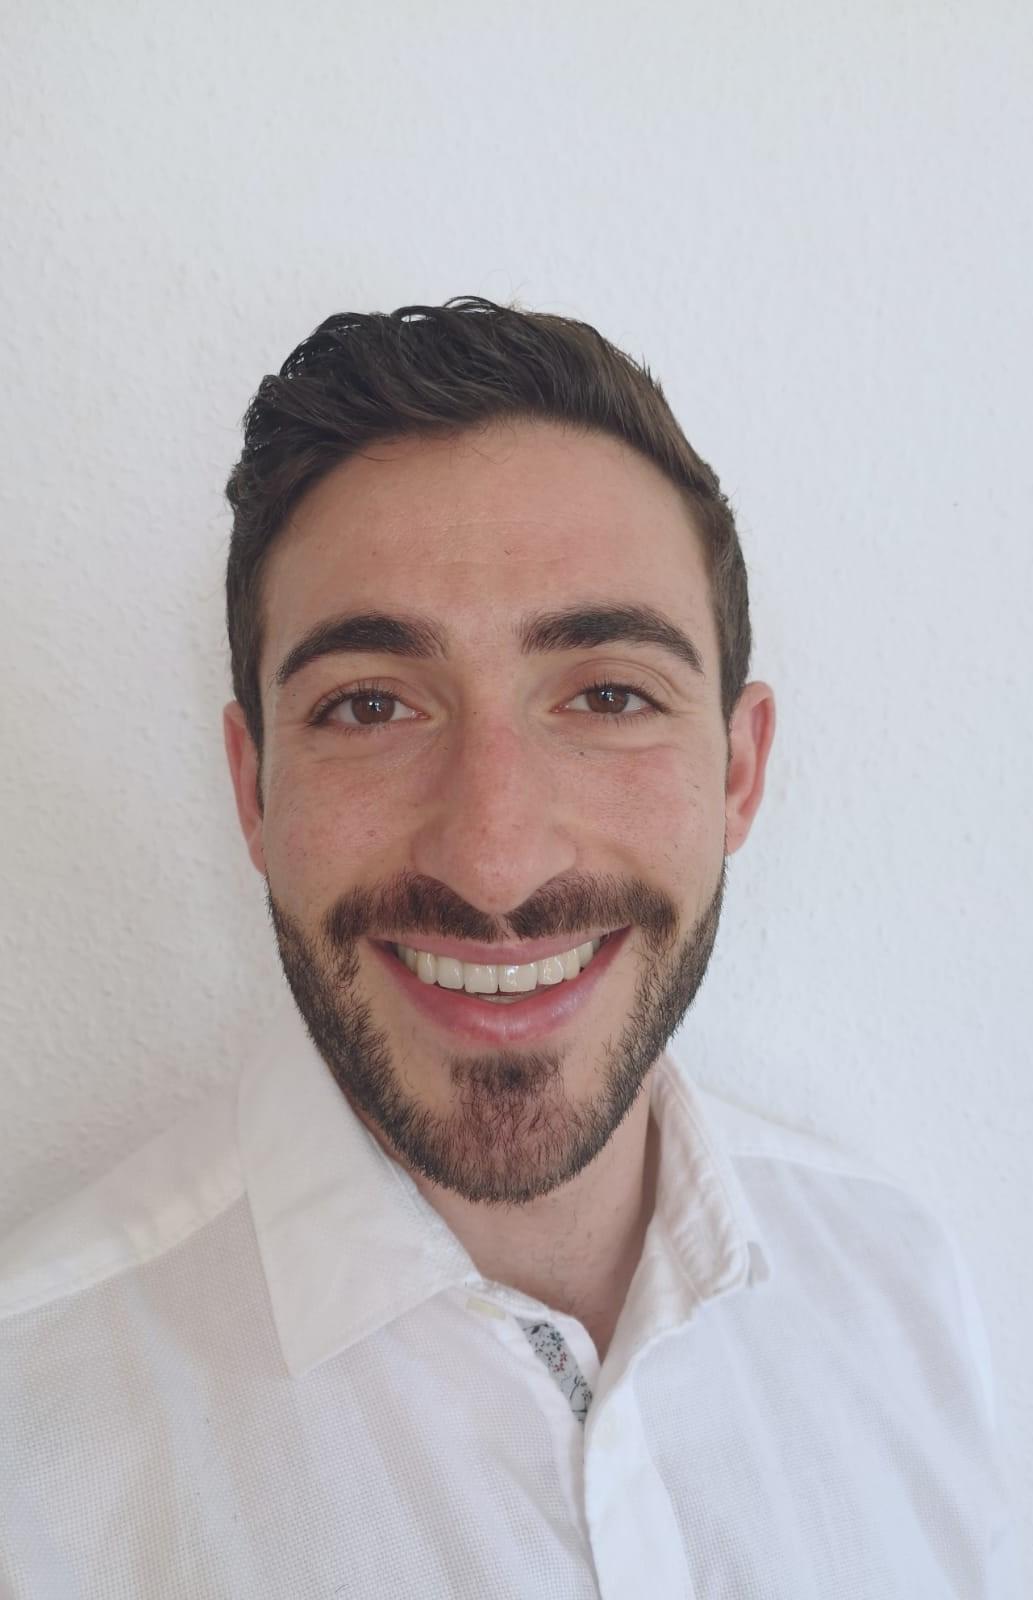 Gianluca Minucci